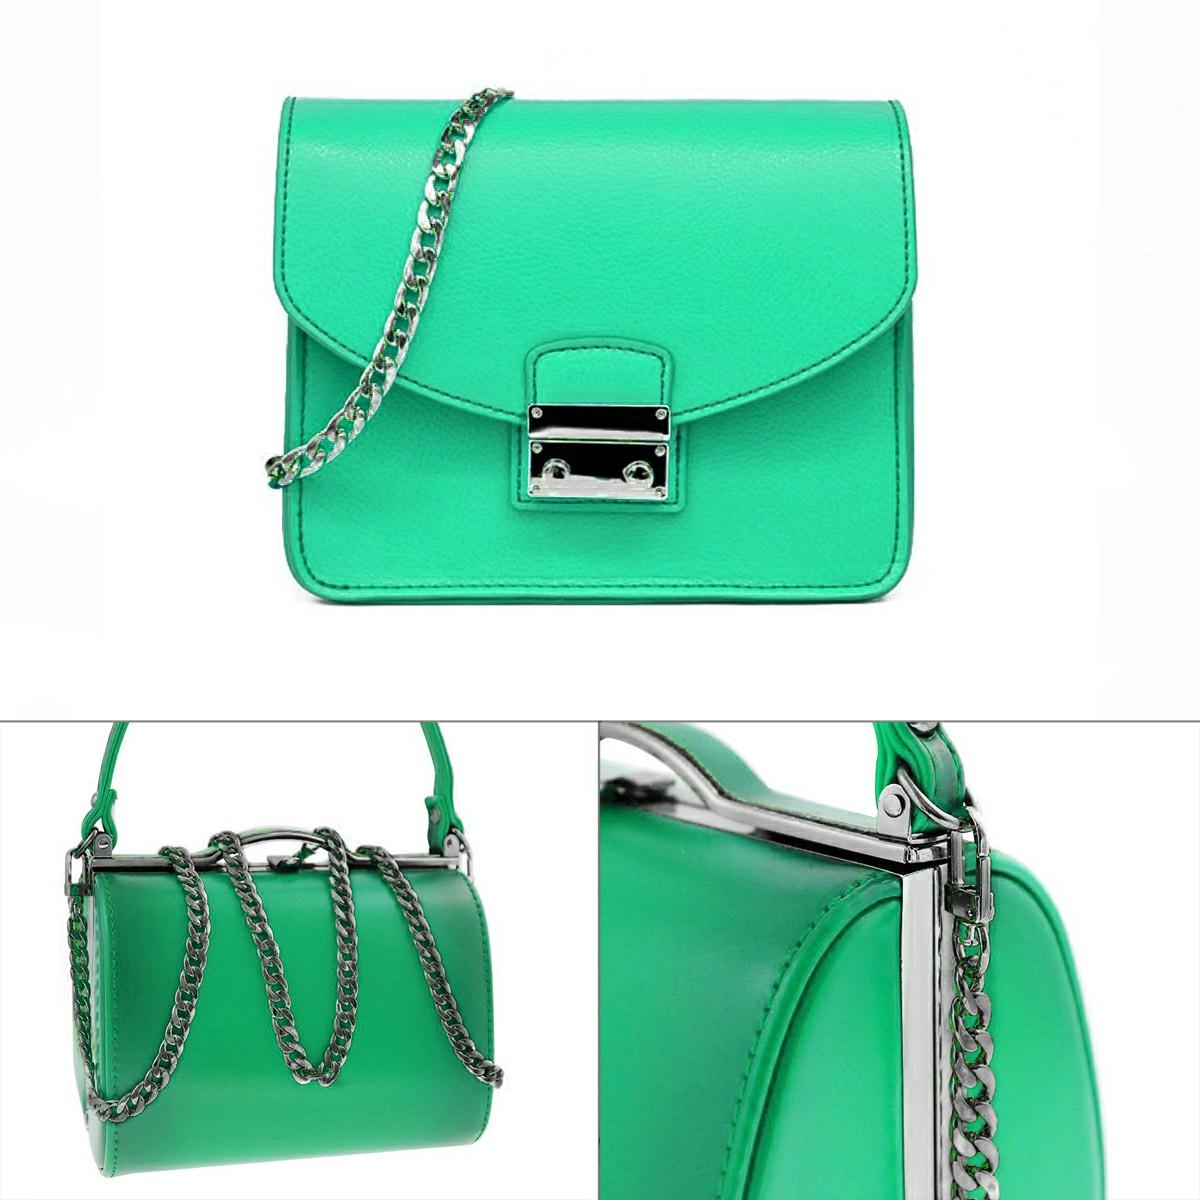 Bag Metal Flat Chain Replacement Strap for Handbag Purse - Black